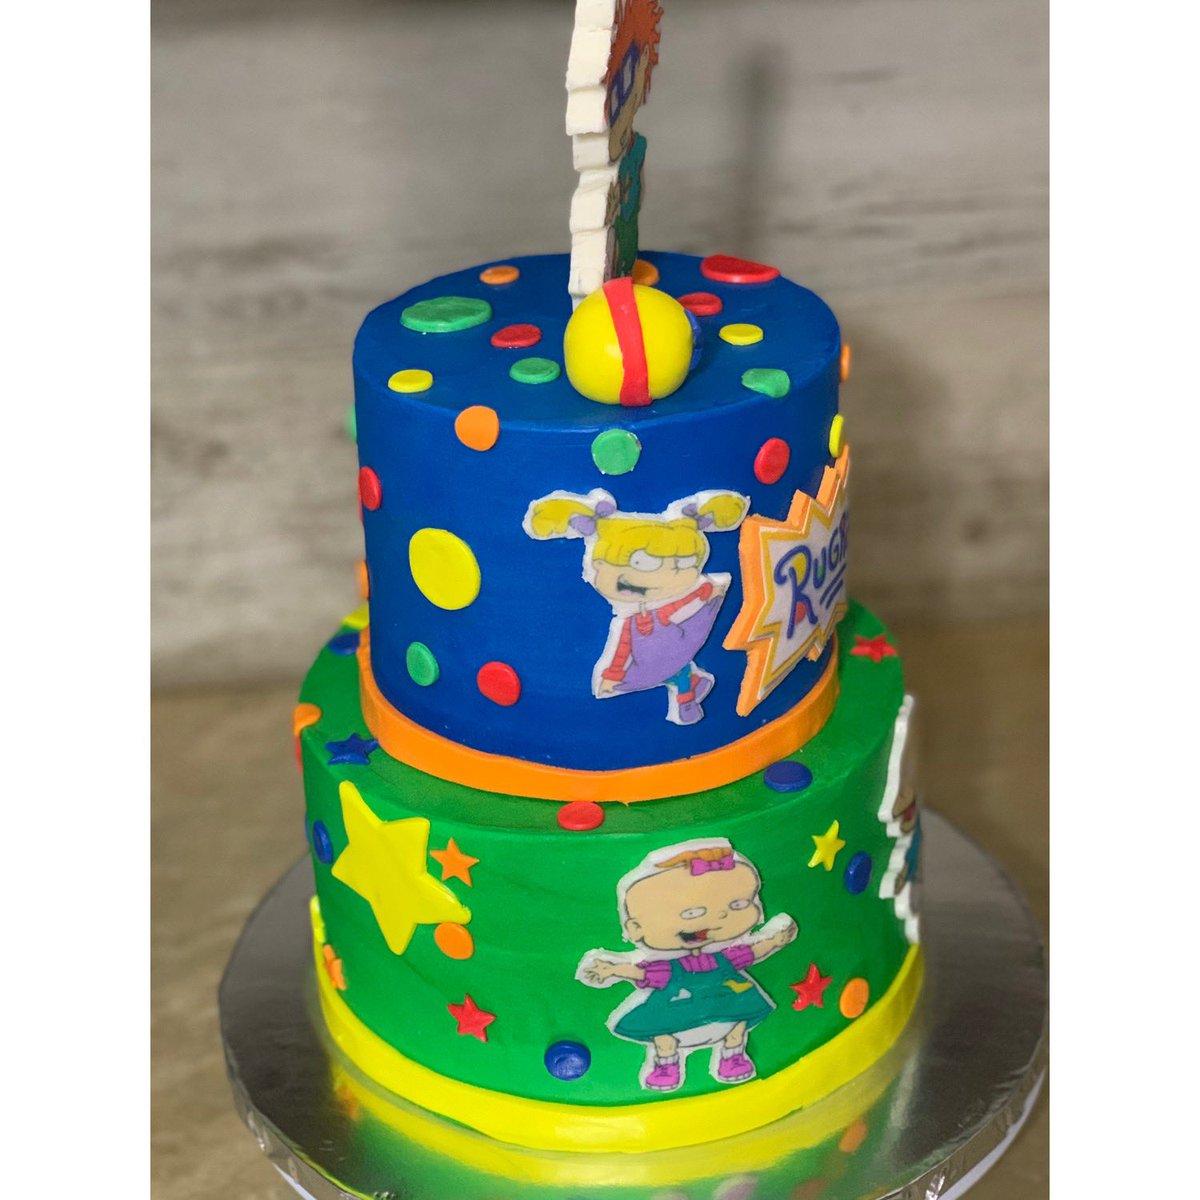 Awe Inspiring Thecupcakepoet On Twitter Rugrats Cake Nickelodeon Nickelodeon Funny Birthday Cards Online Necthendildamsfinfo